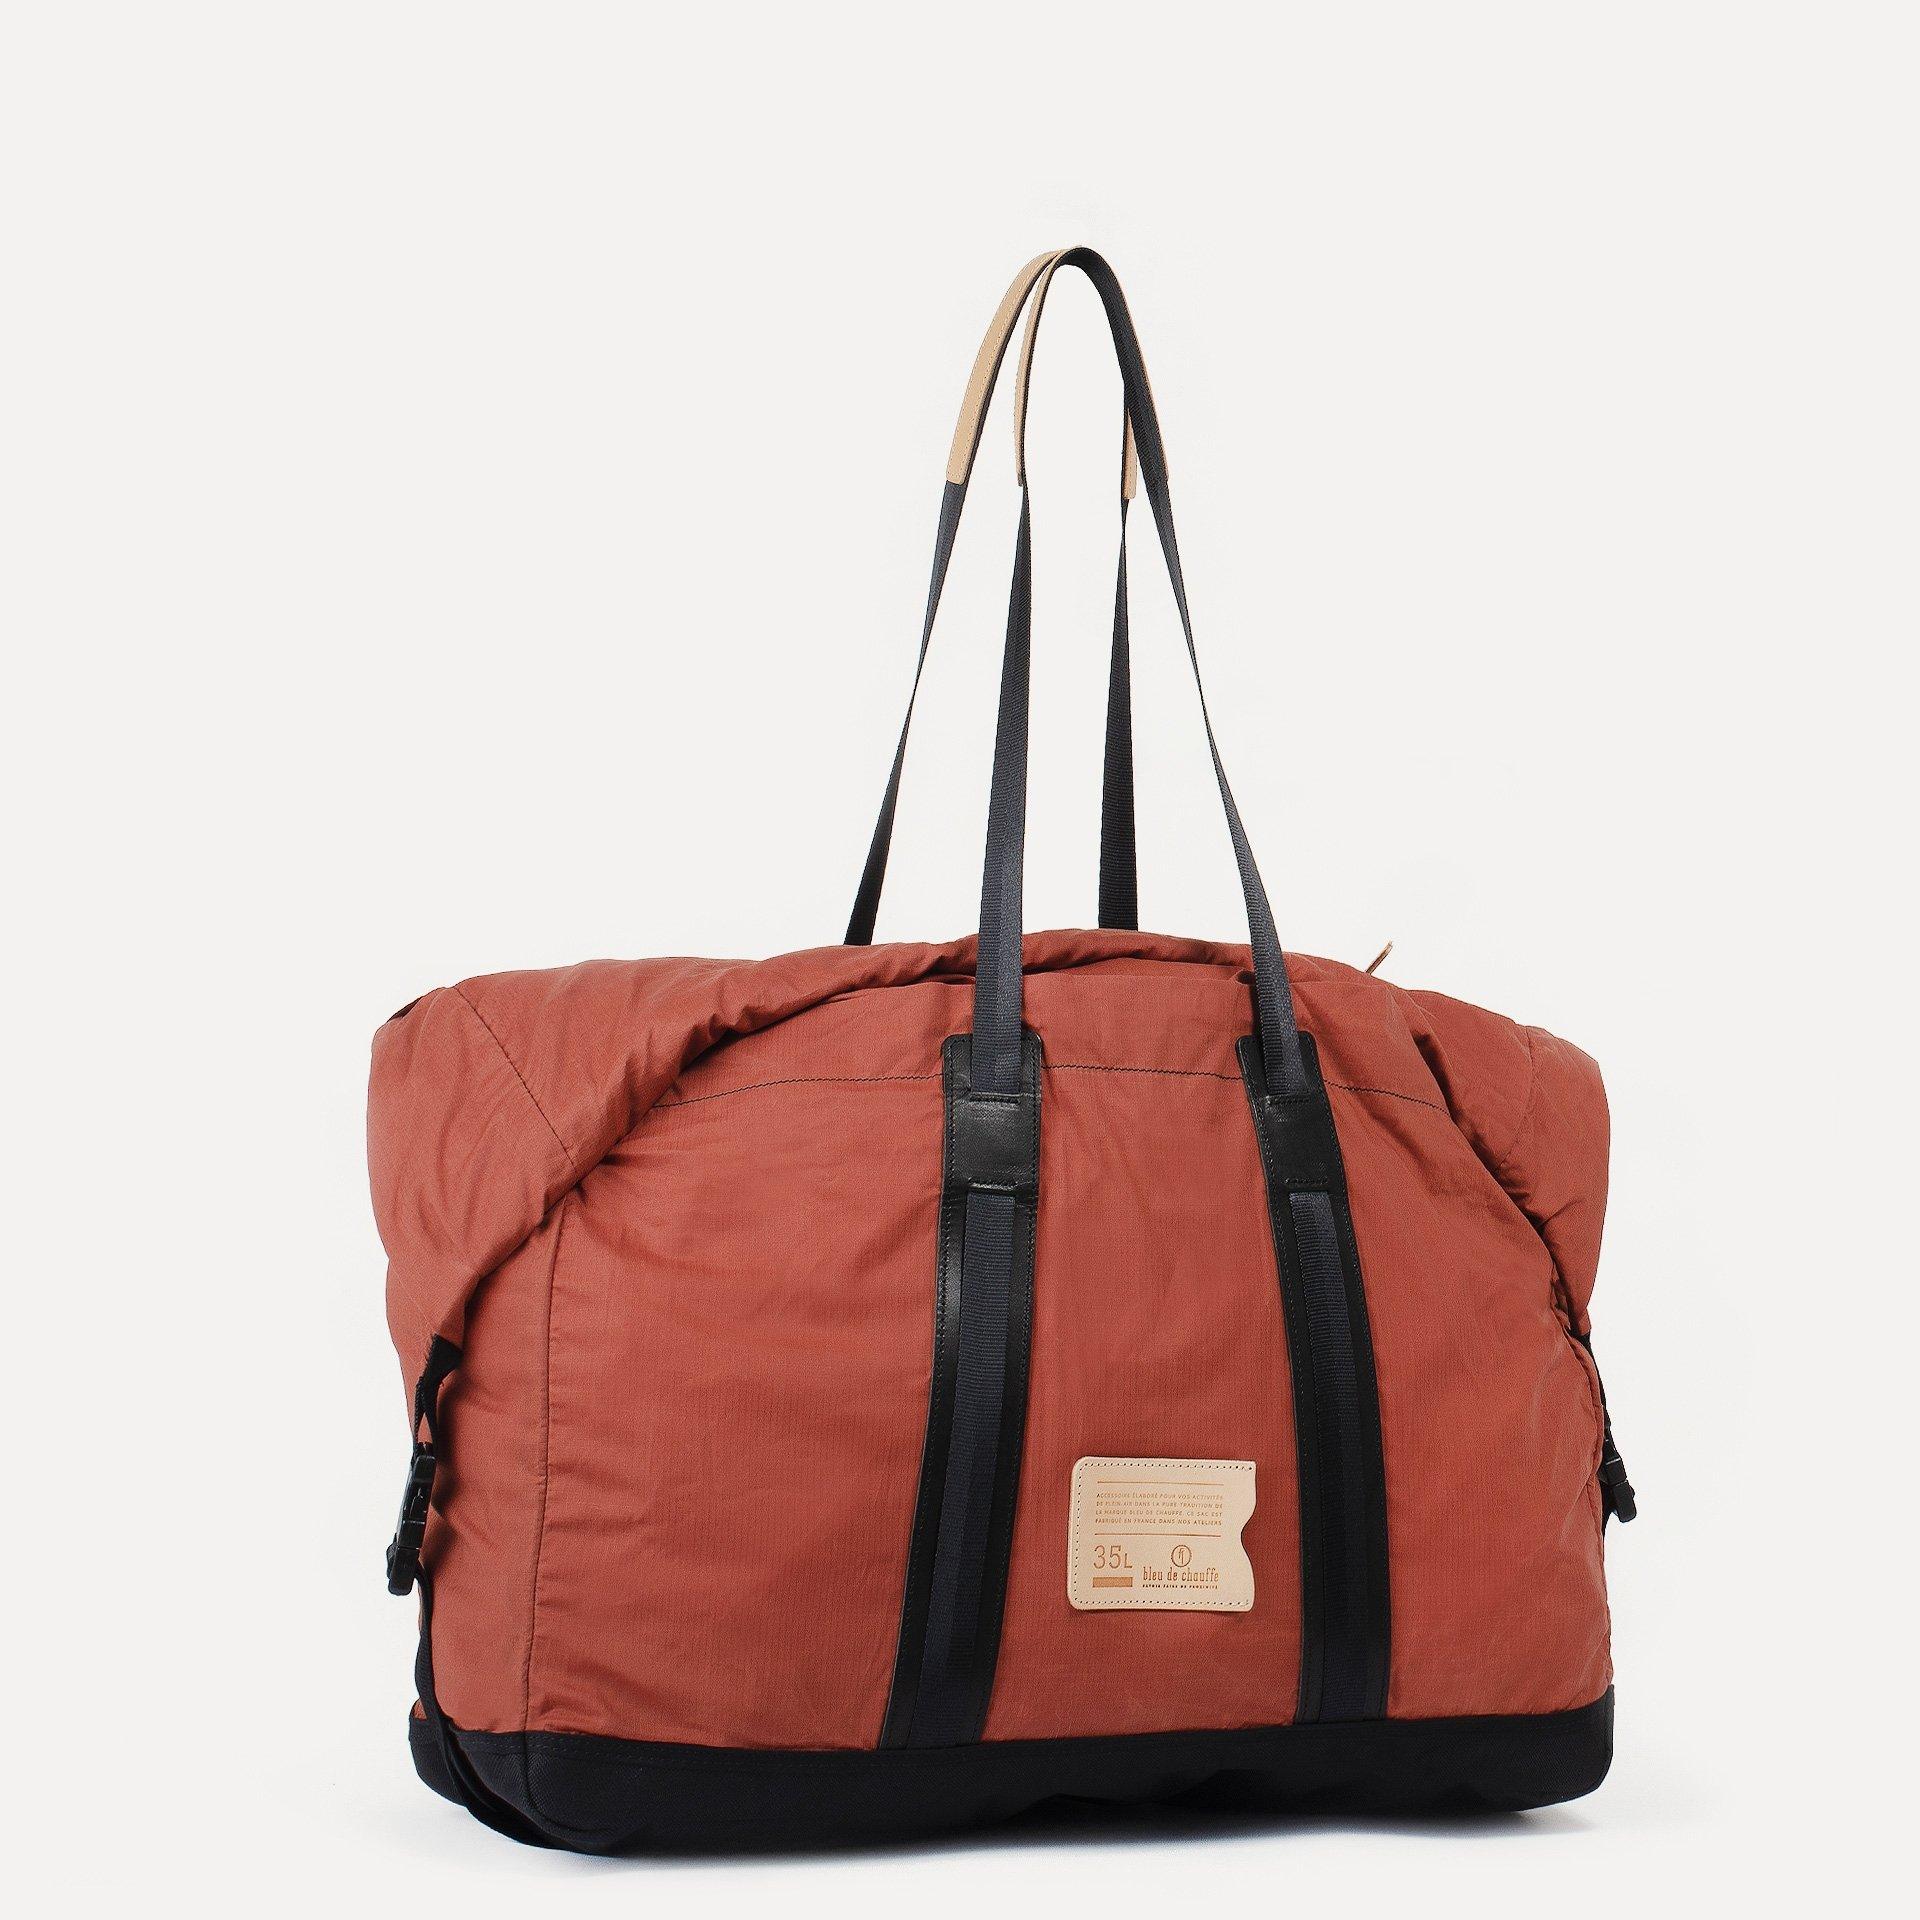 35L Baroud Travel bag - Burgundy (image n°2)